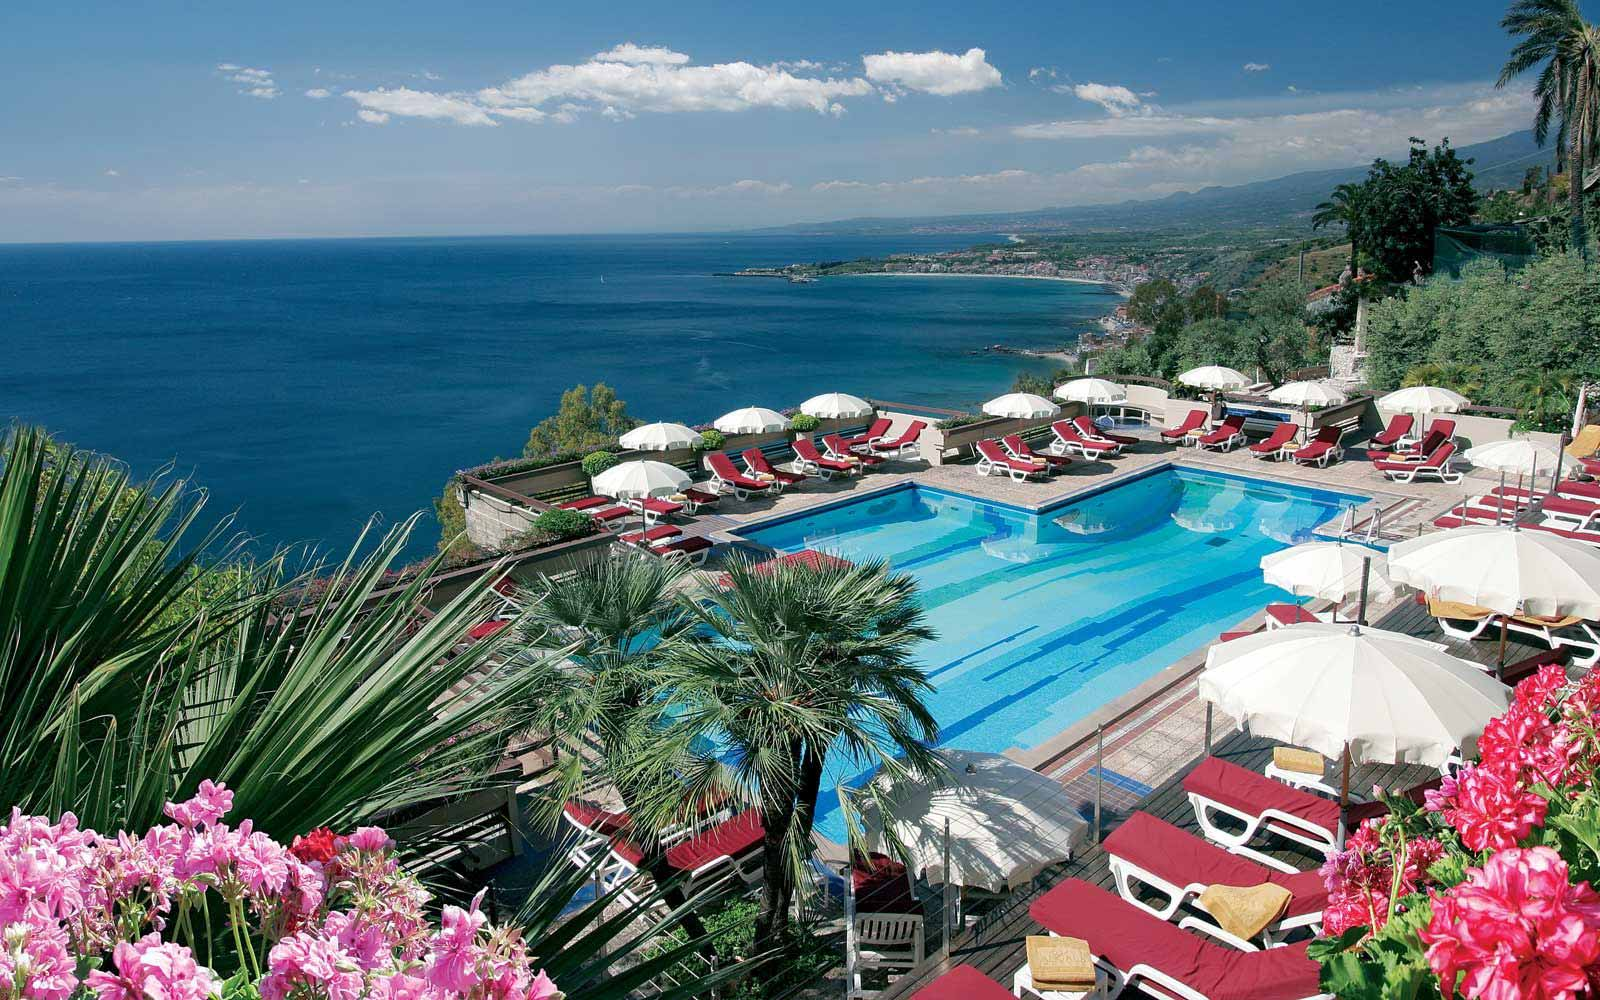 Swimming pool at Hotel Monte Tauro